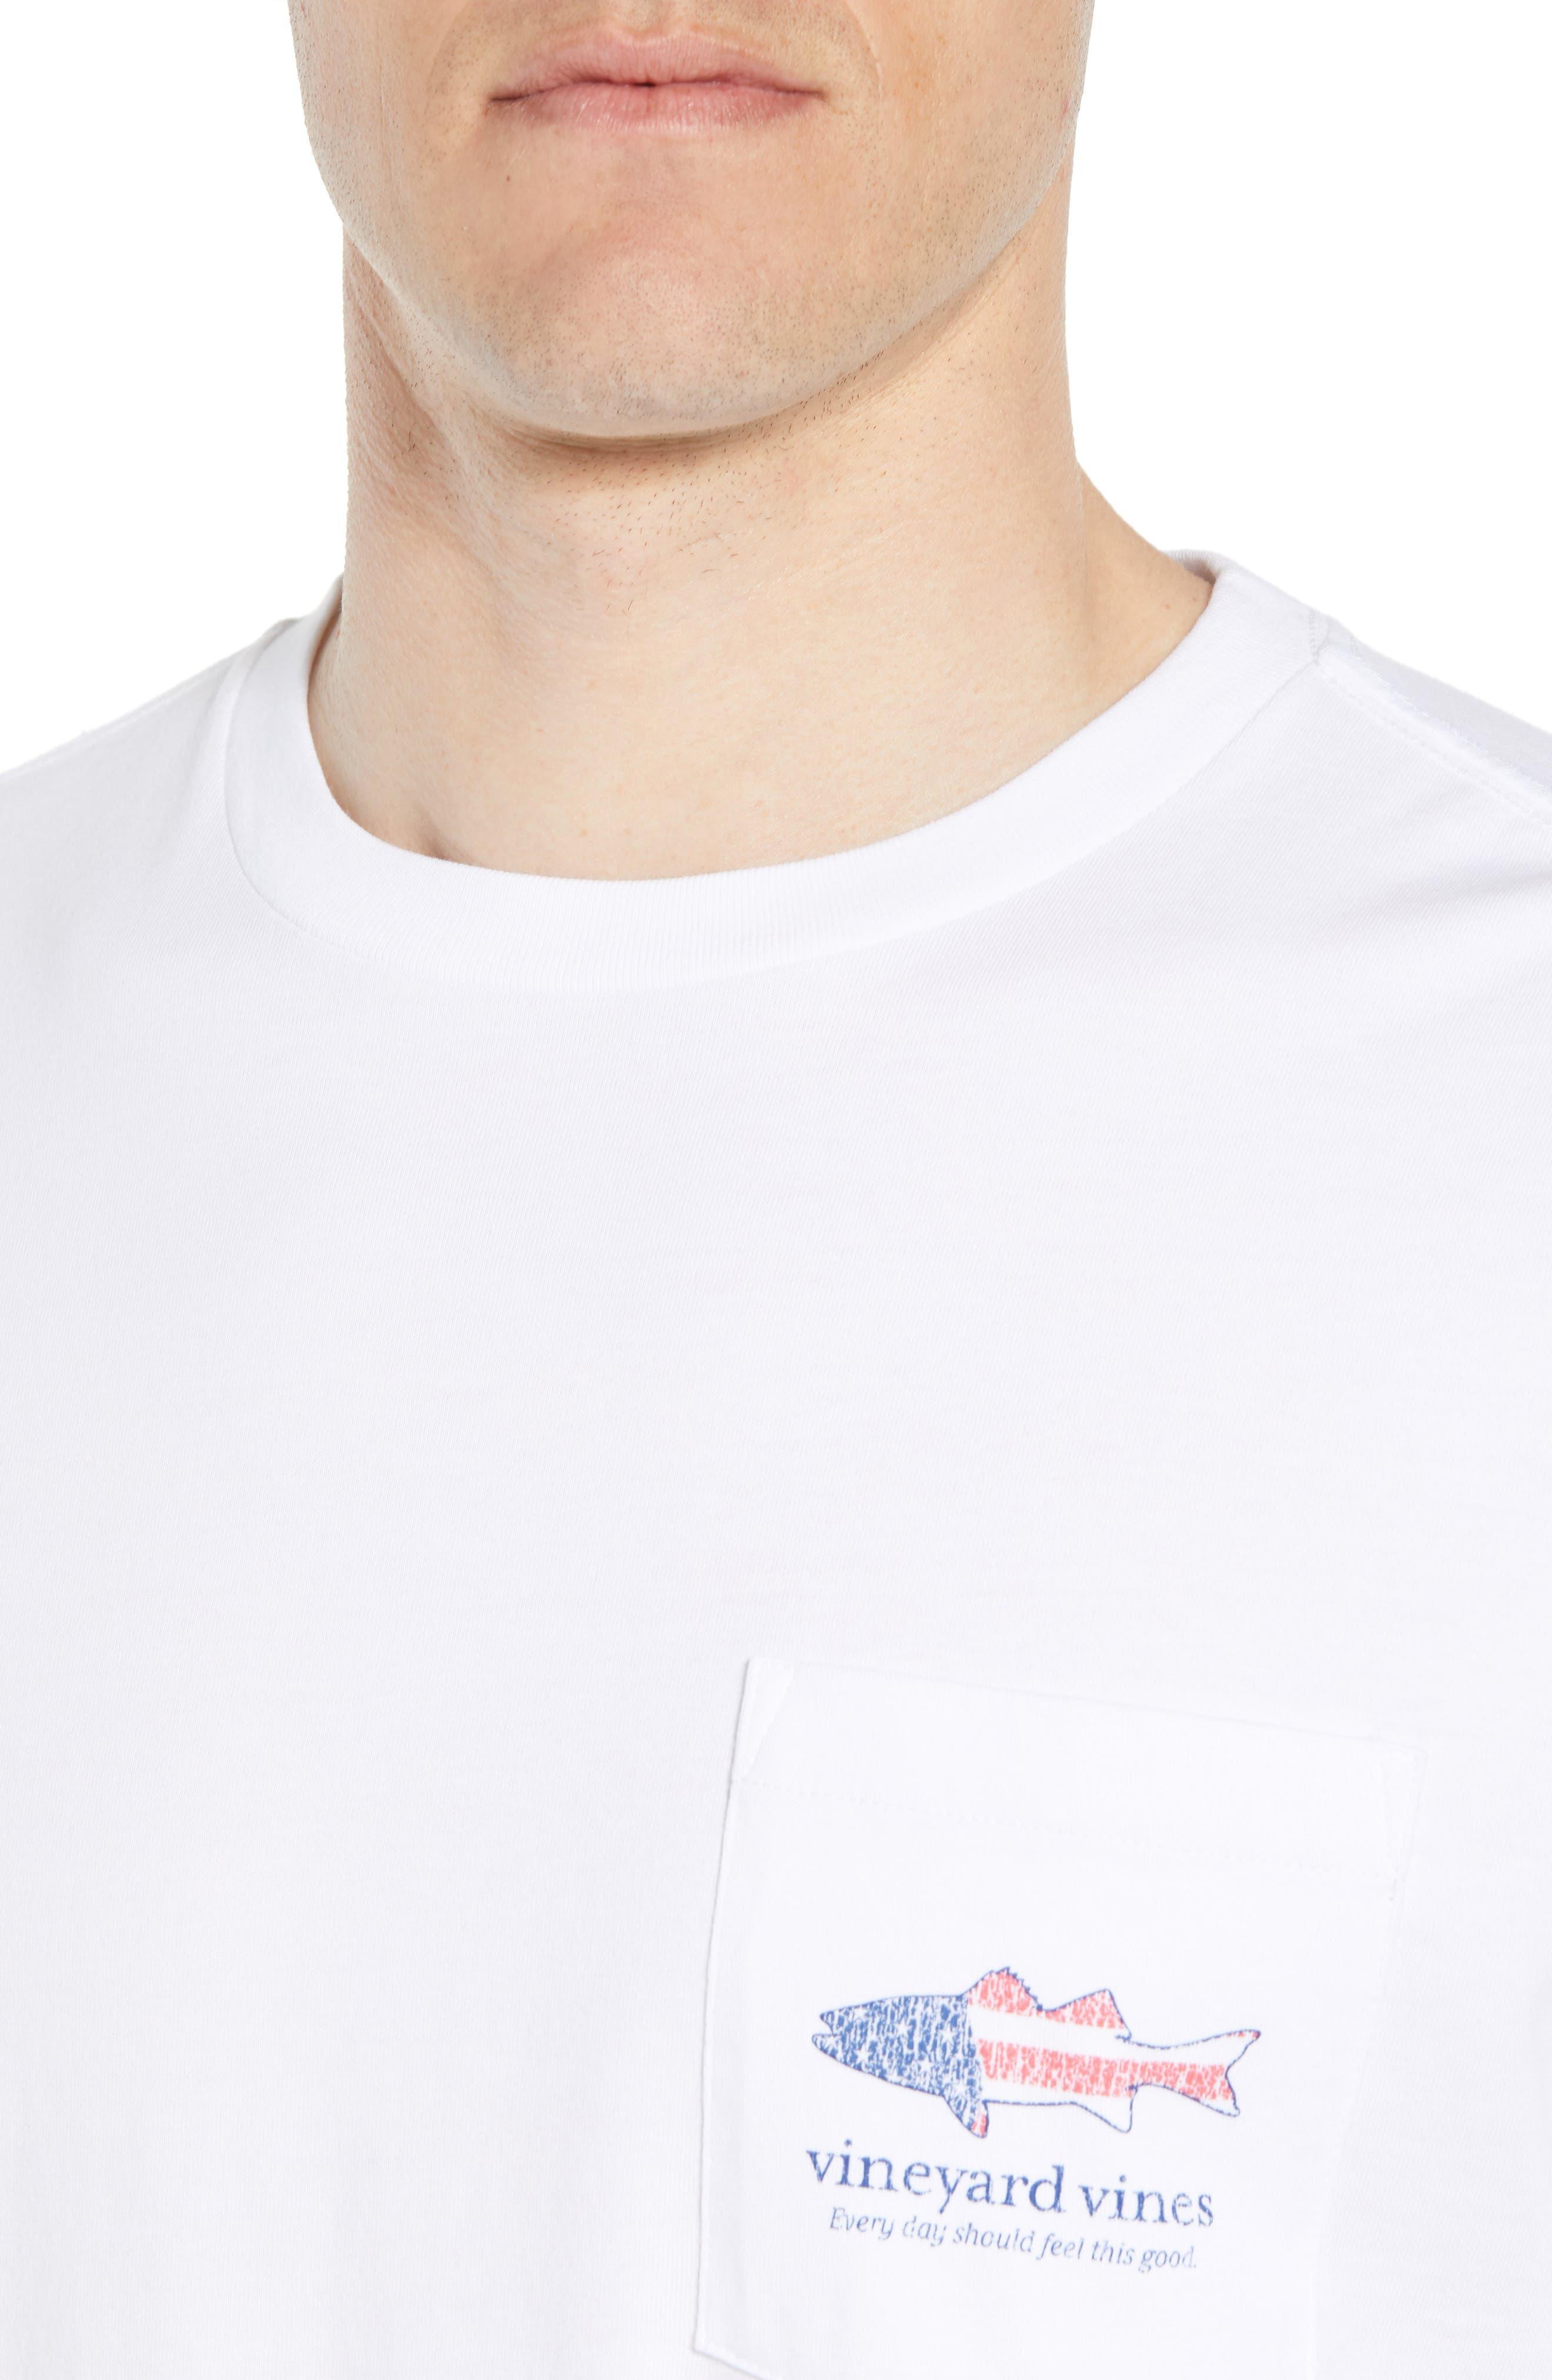 Grouper Flat Crewneck T-Shirt,                             Alternate thumbnail 4, color,                             White Cap